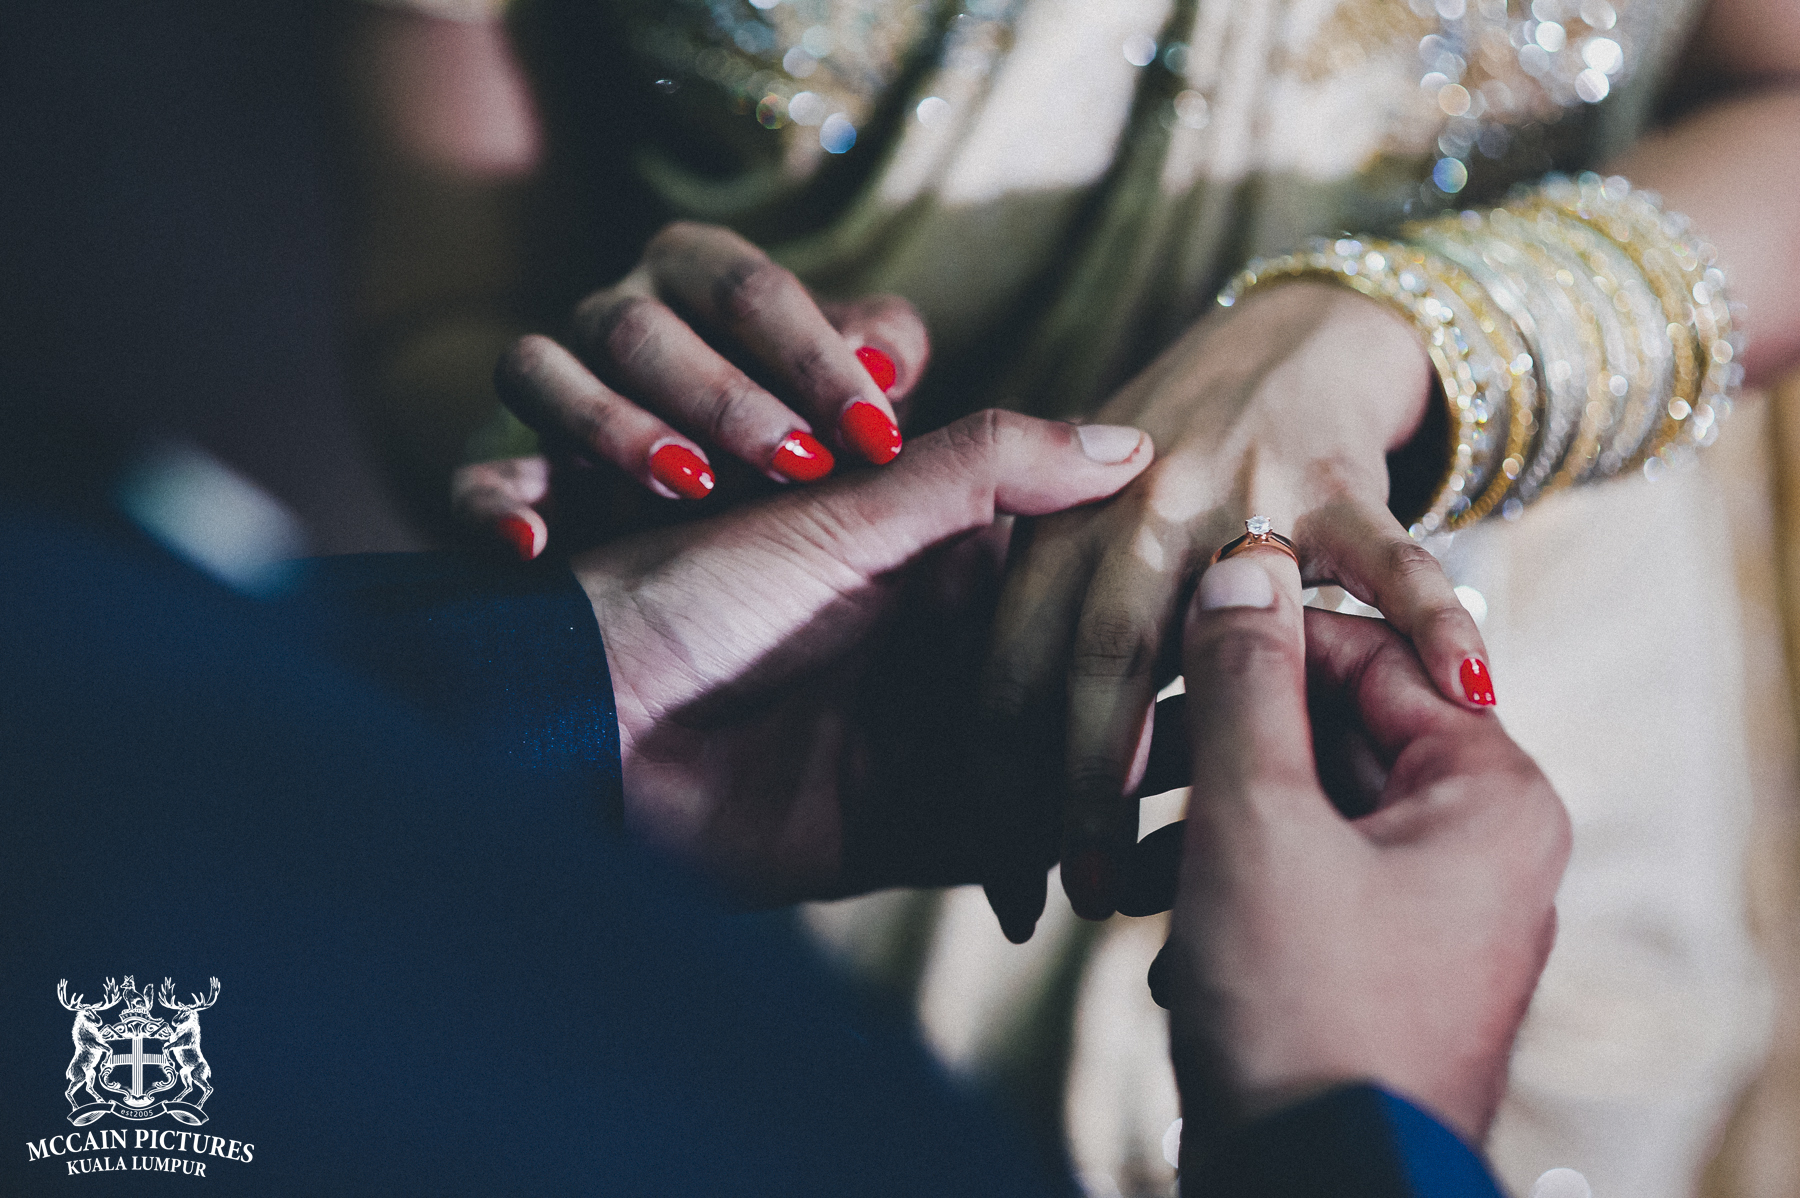 mccain goh mccain pictures wedding photographer malaysia-362